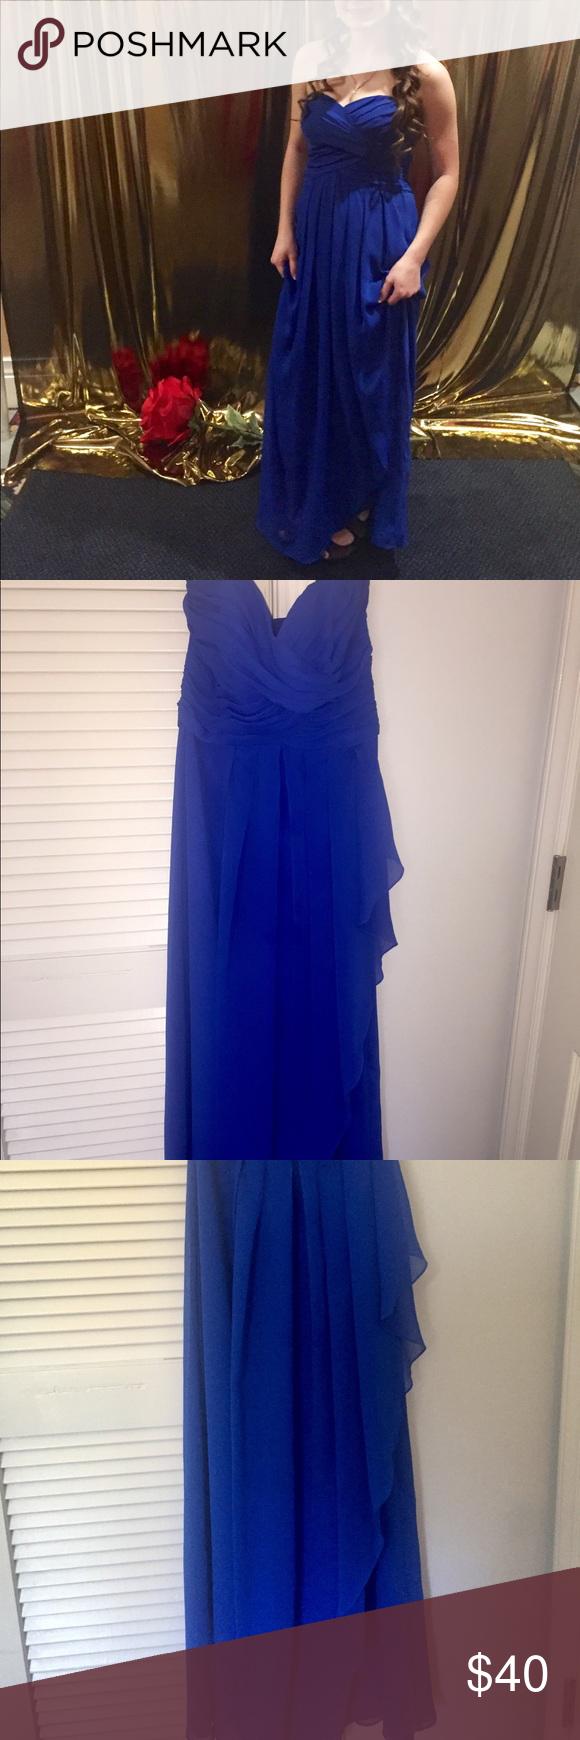 Prom dress royal blue size